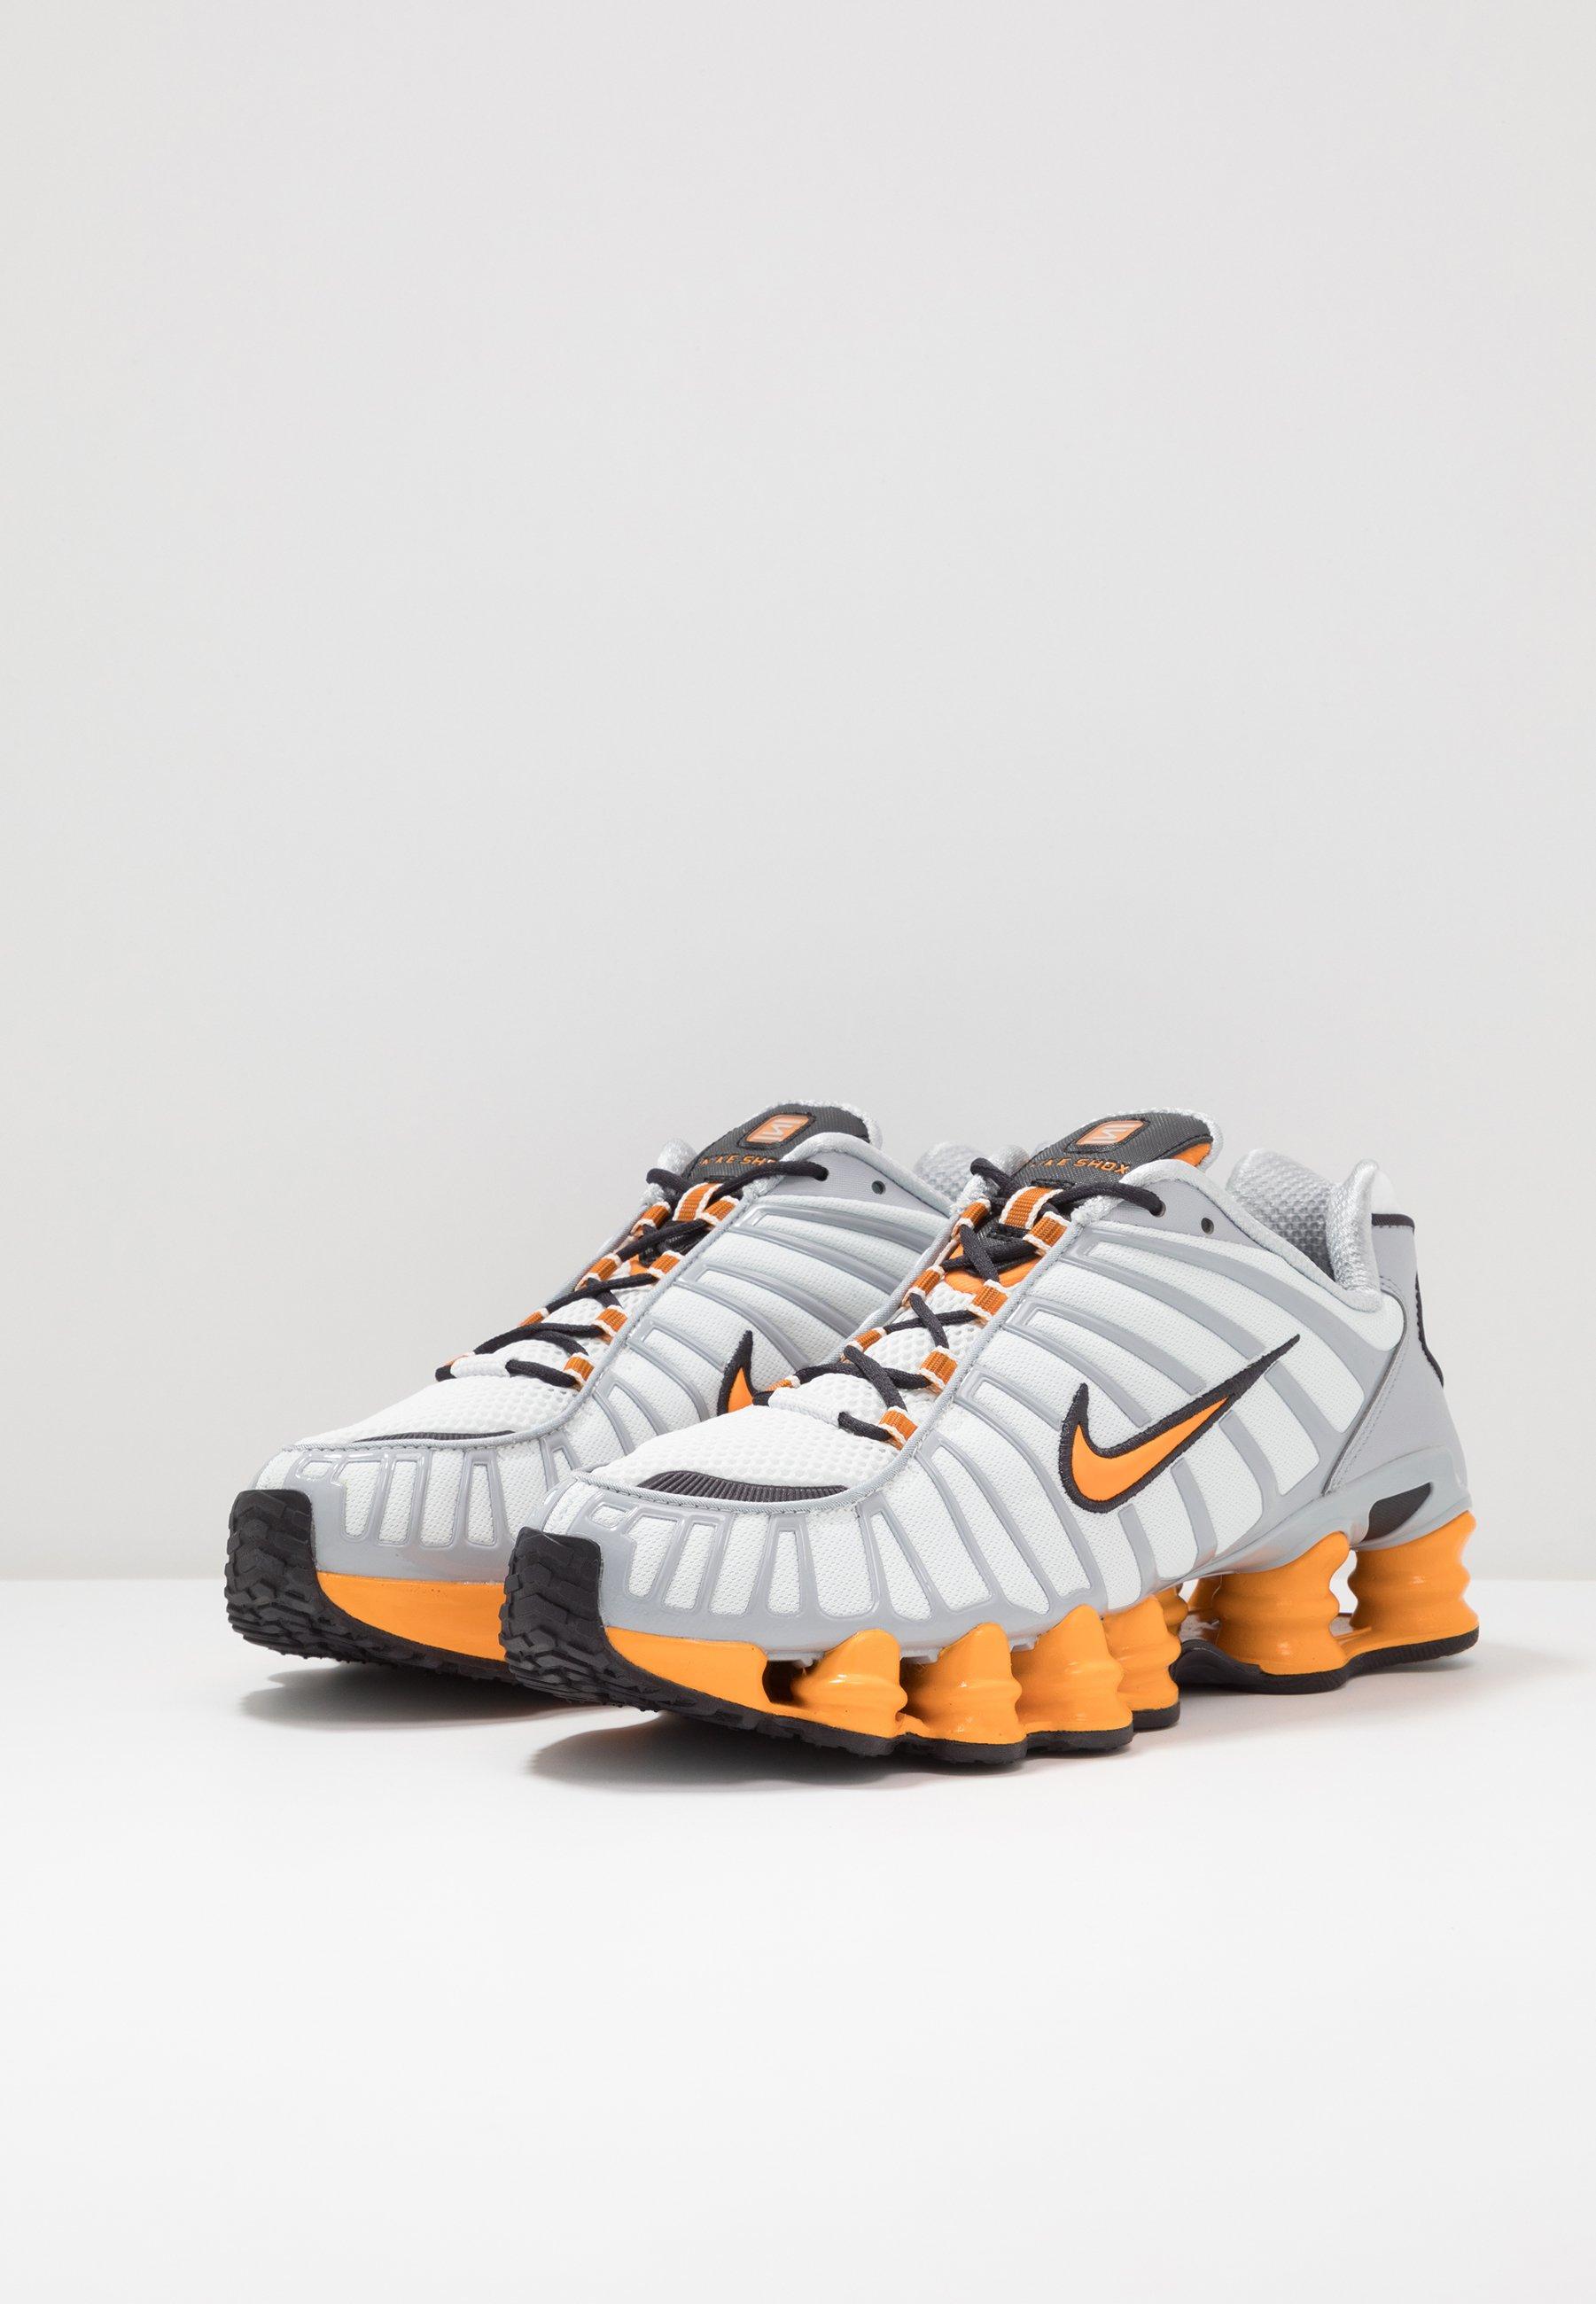 Nike Shox TL Herrenschuh - Baskets basses - offwhite/orange peel/wolf  grey/oil grey